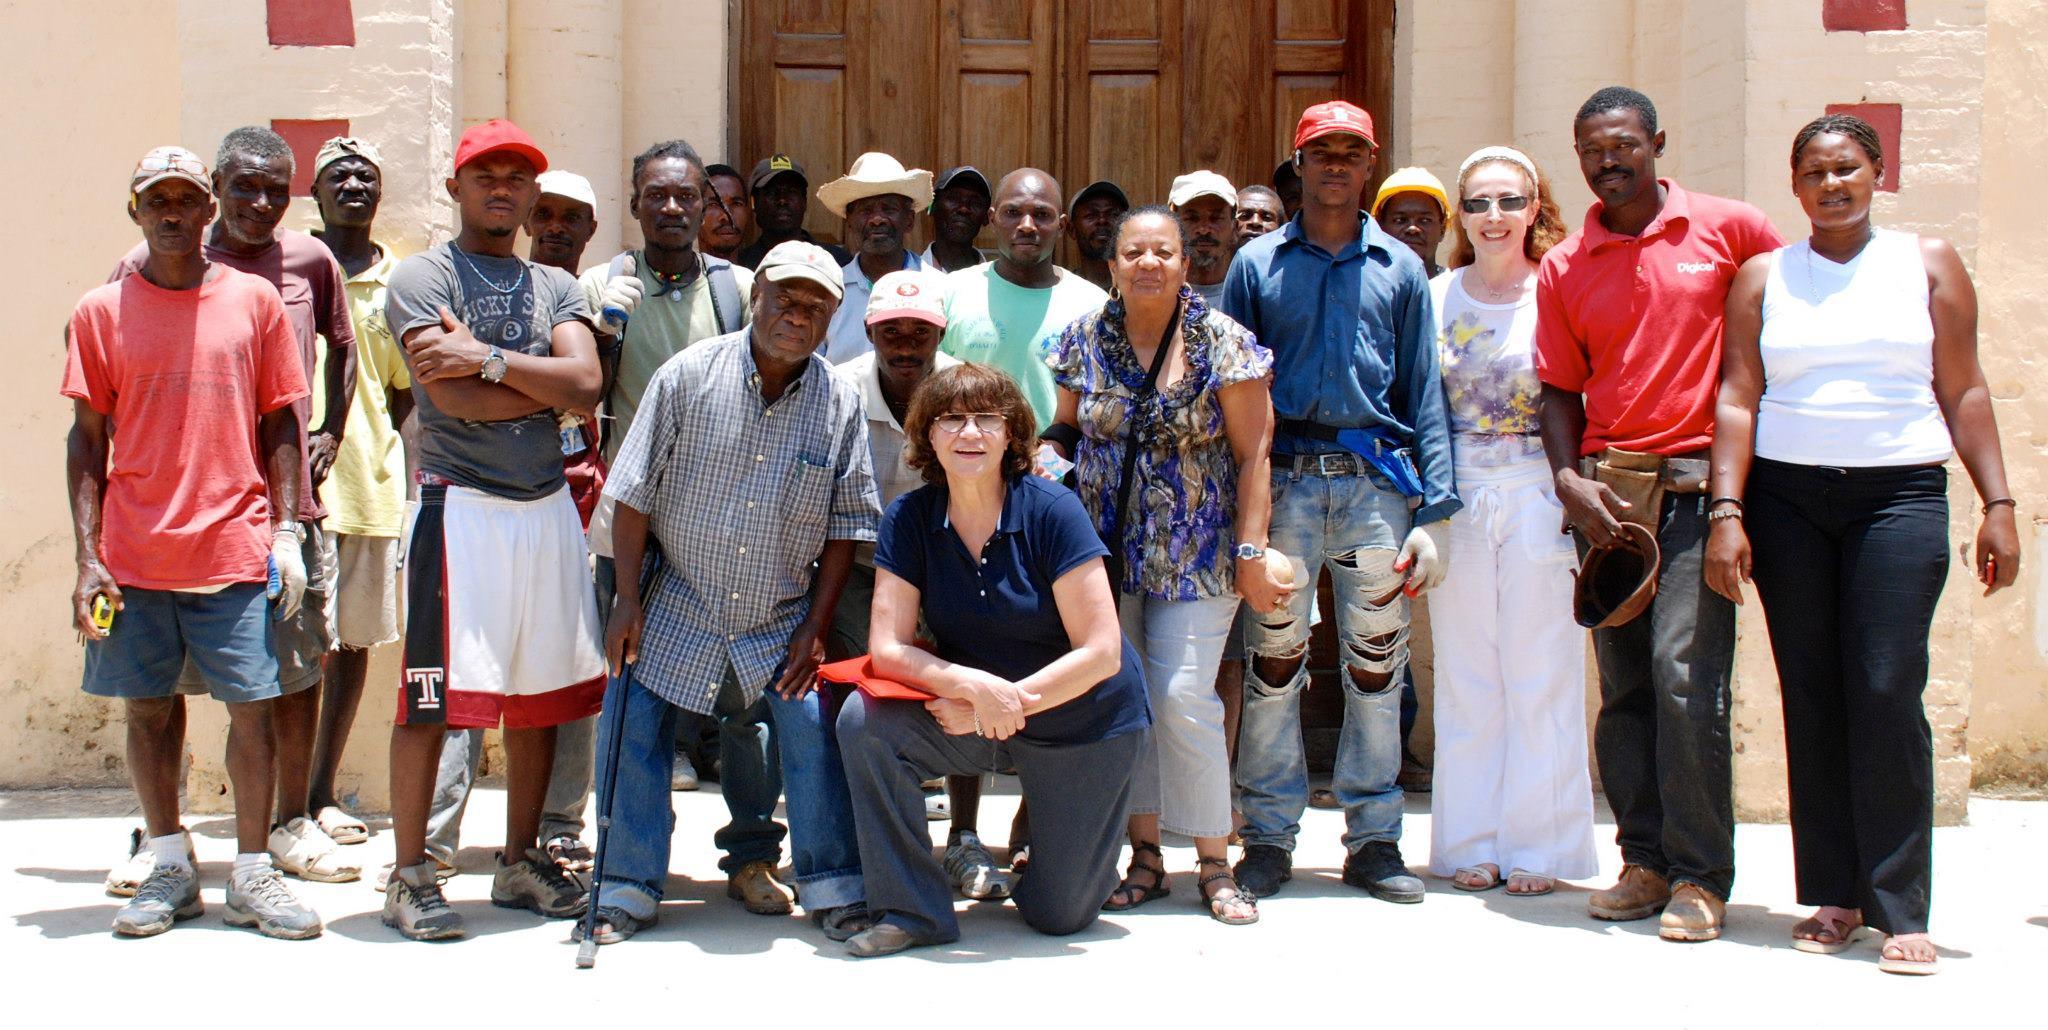 Working on St. Jean Baptiste in Anse d'Hainault